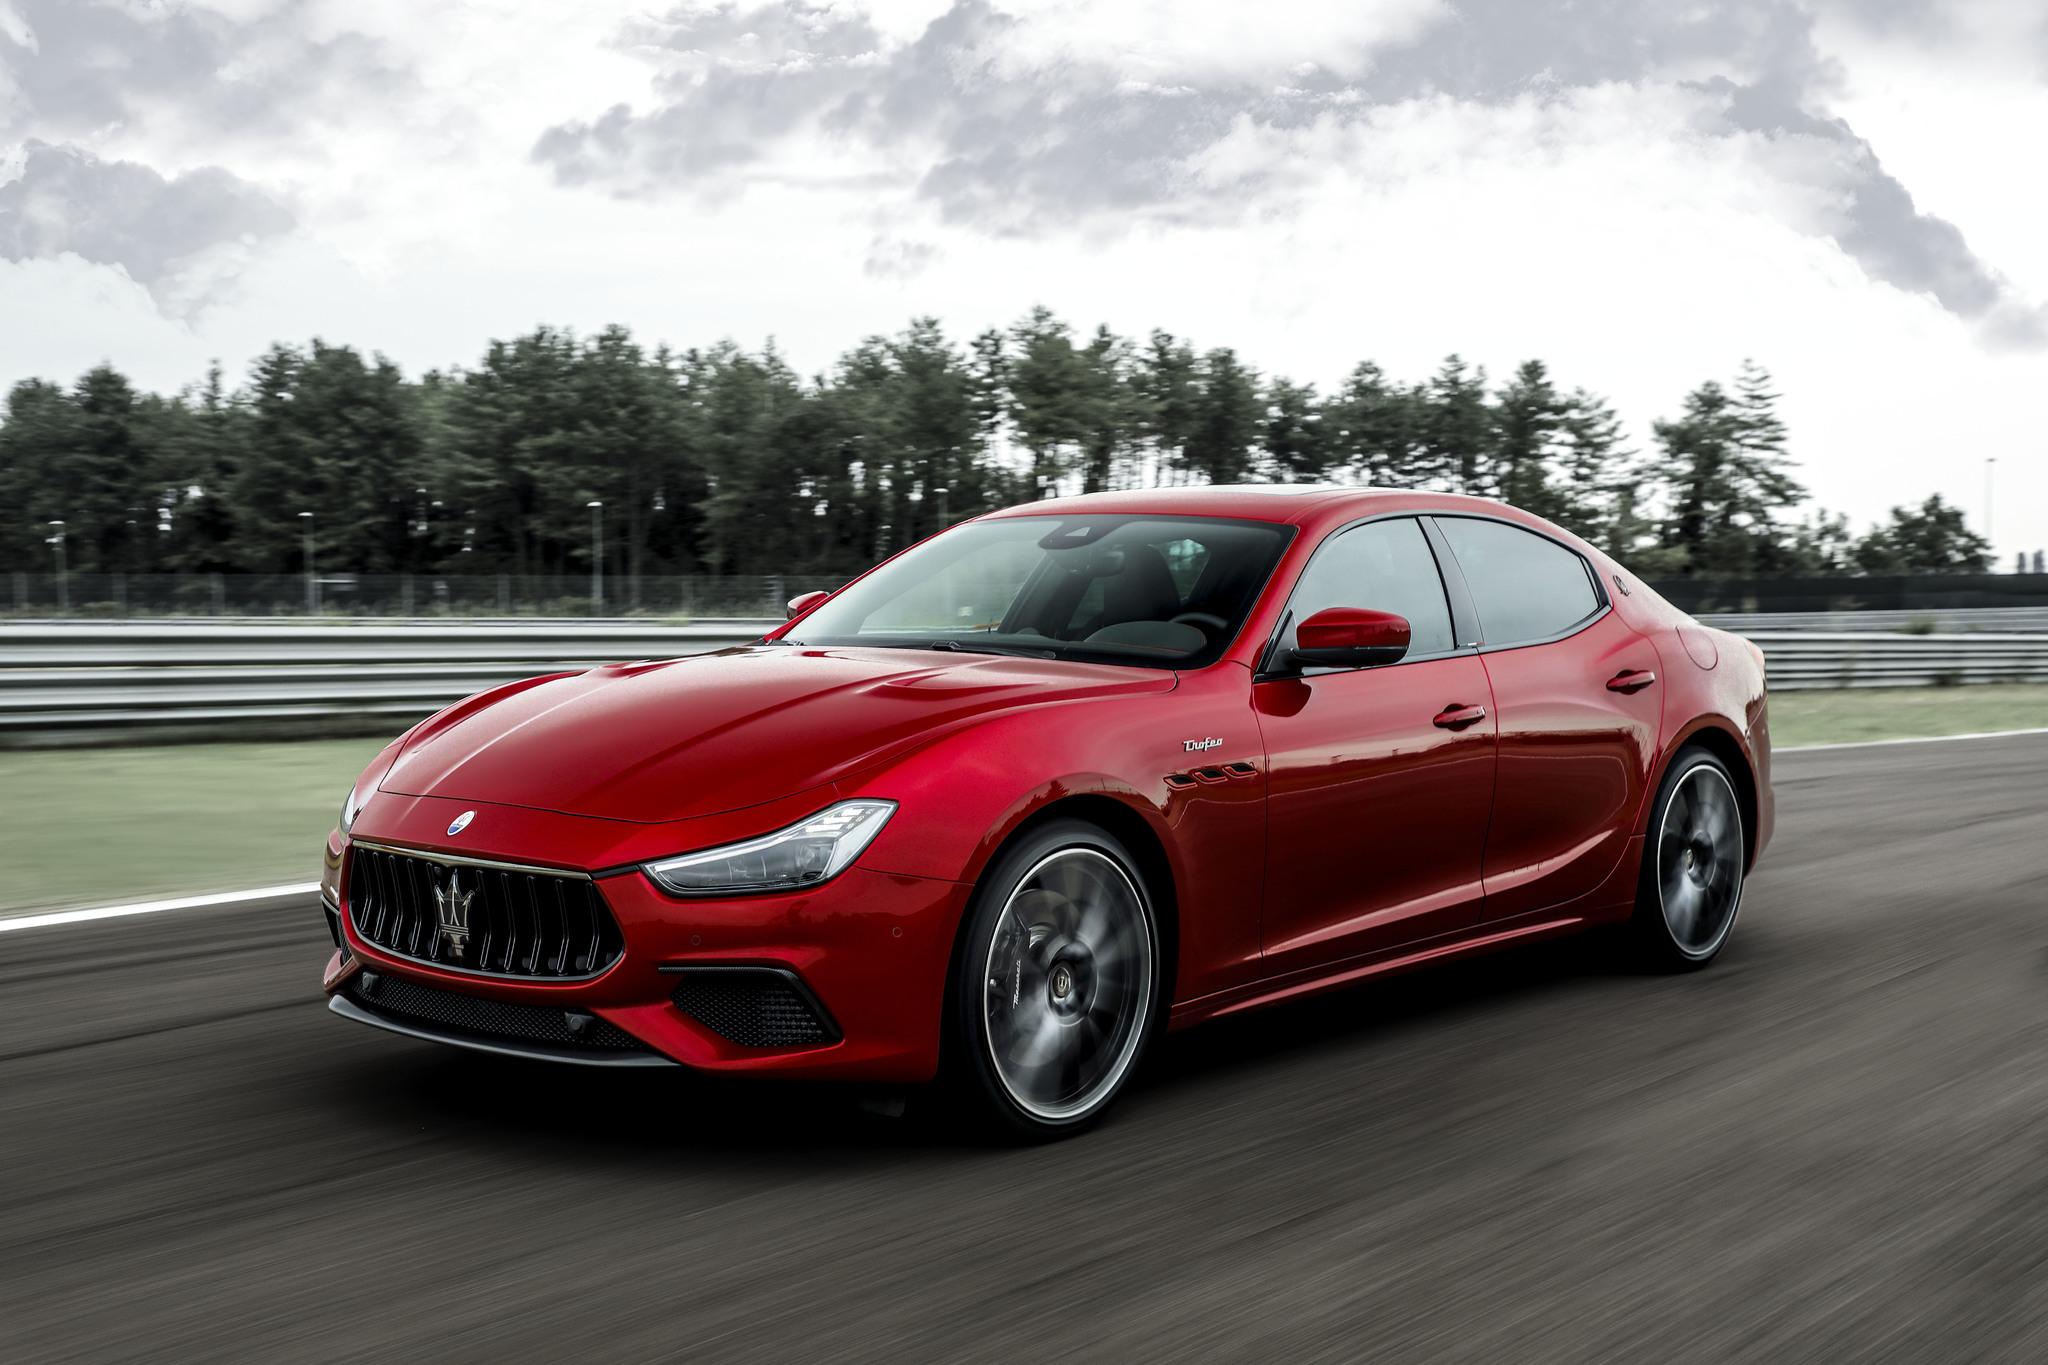 Maserati Ghibli Trofeo (2021, M157) photos